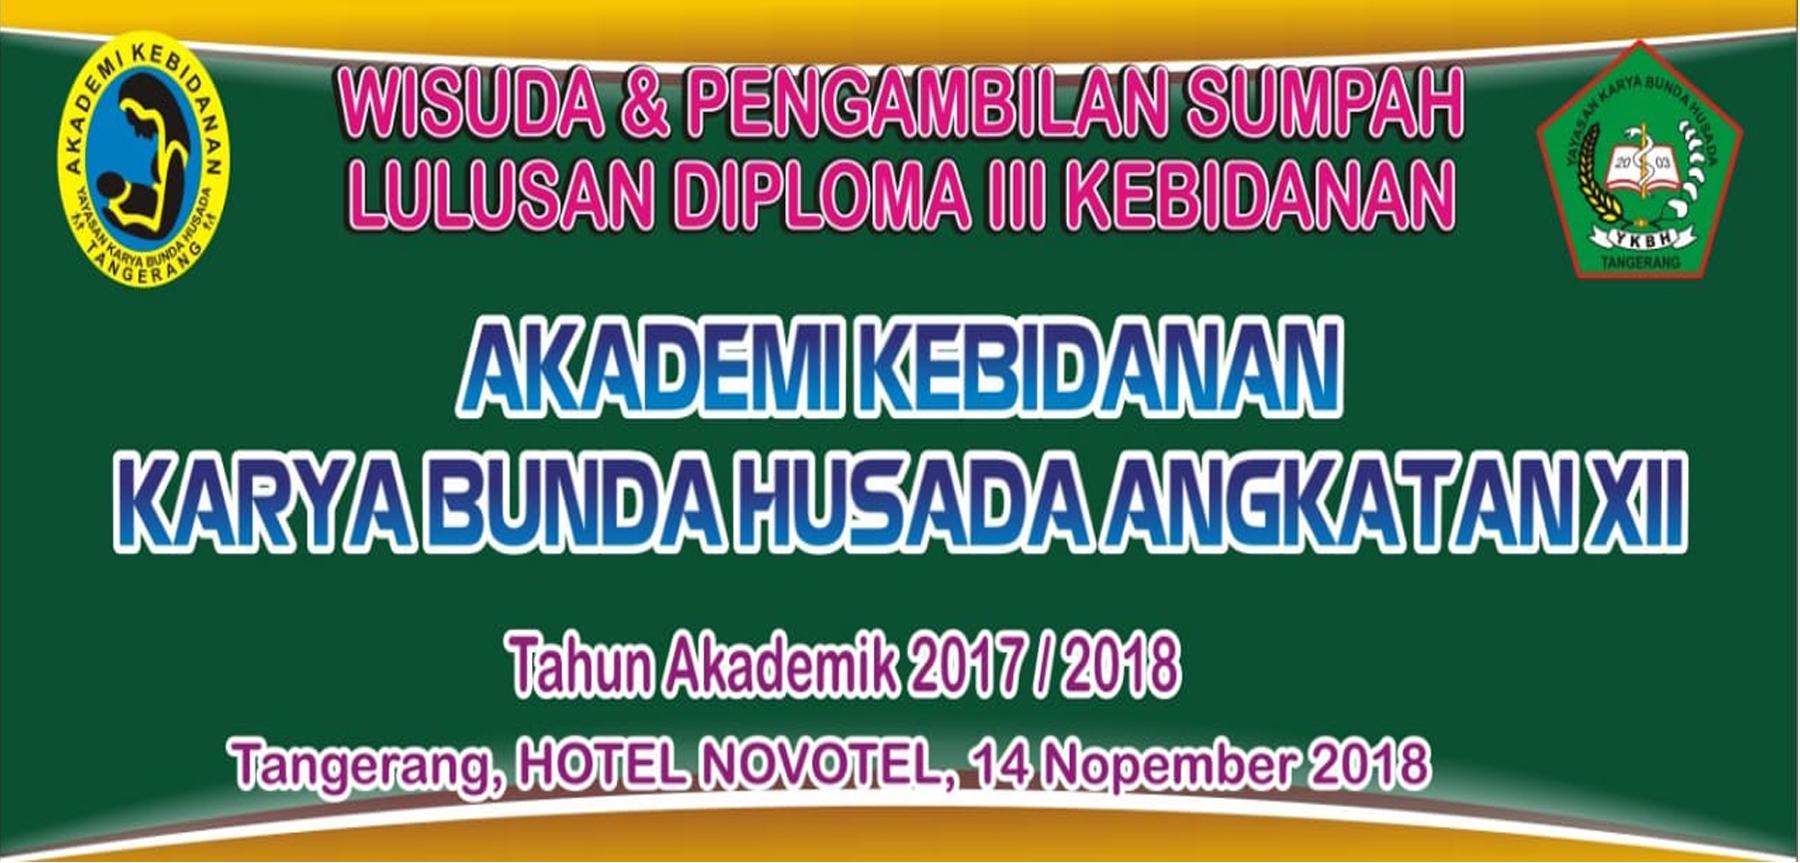 wisuda_AKBID-KBH2018.jpg